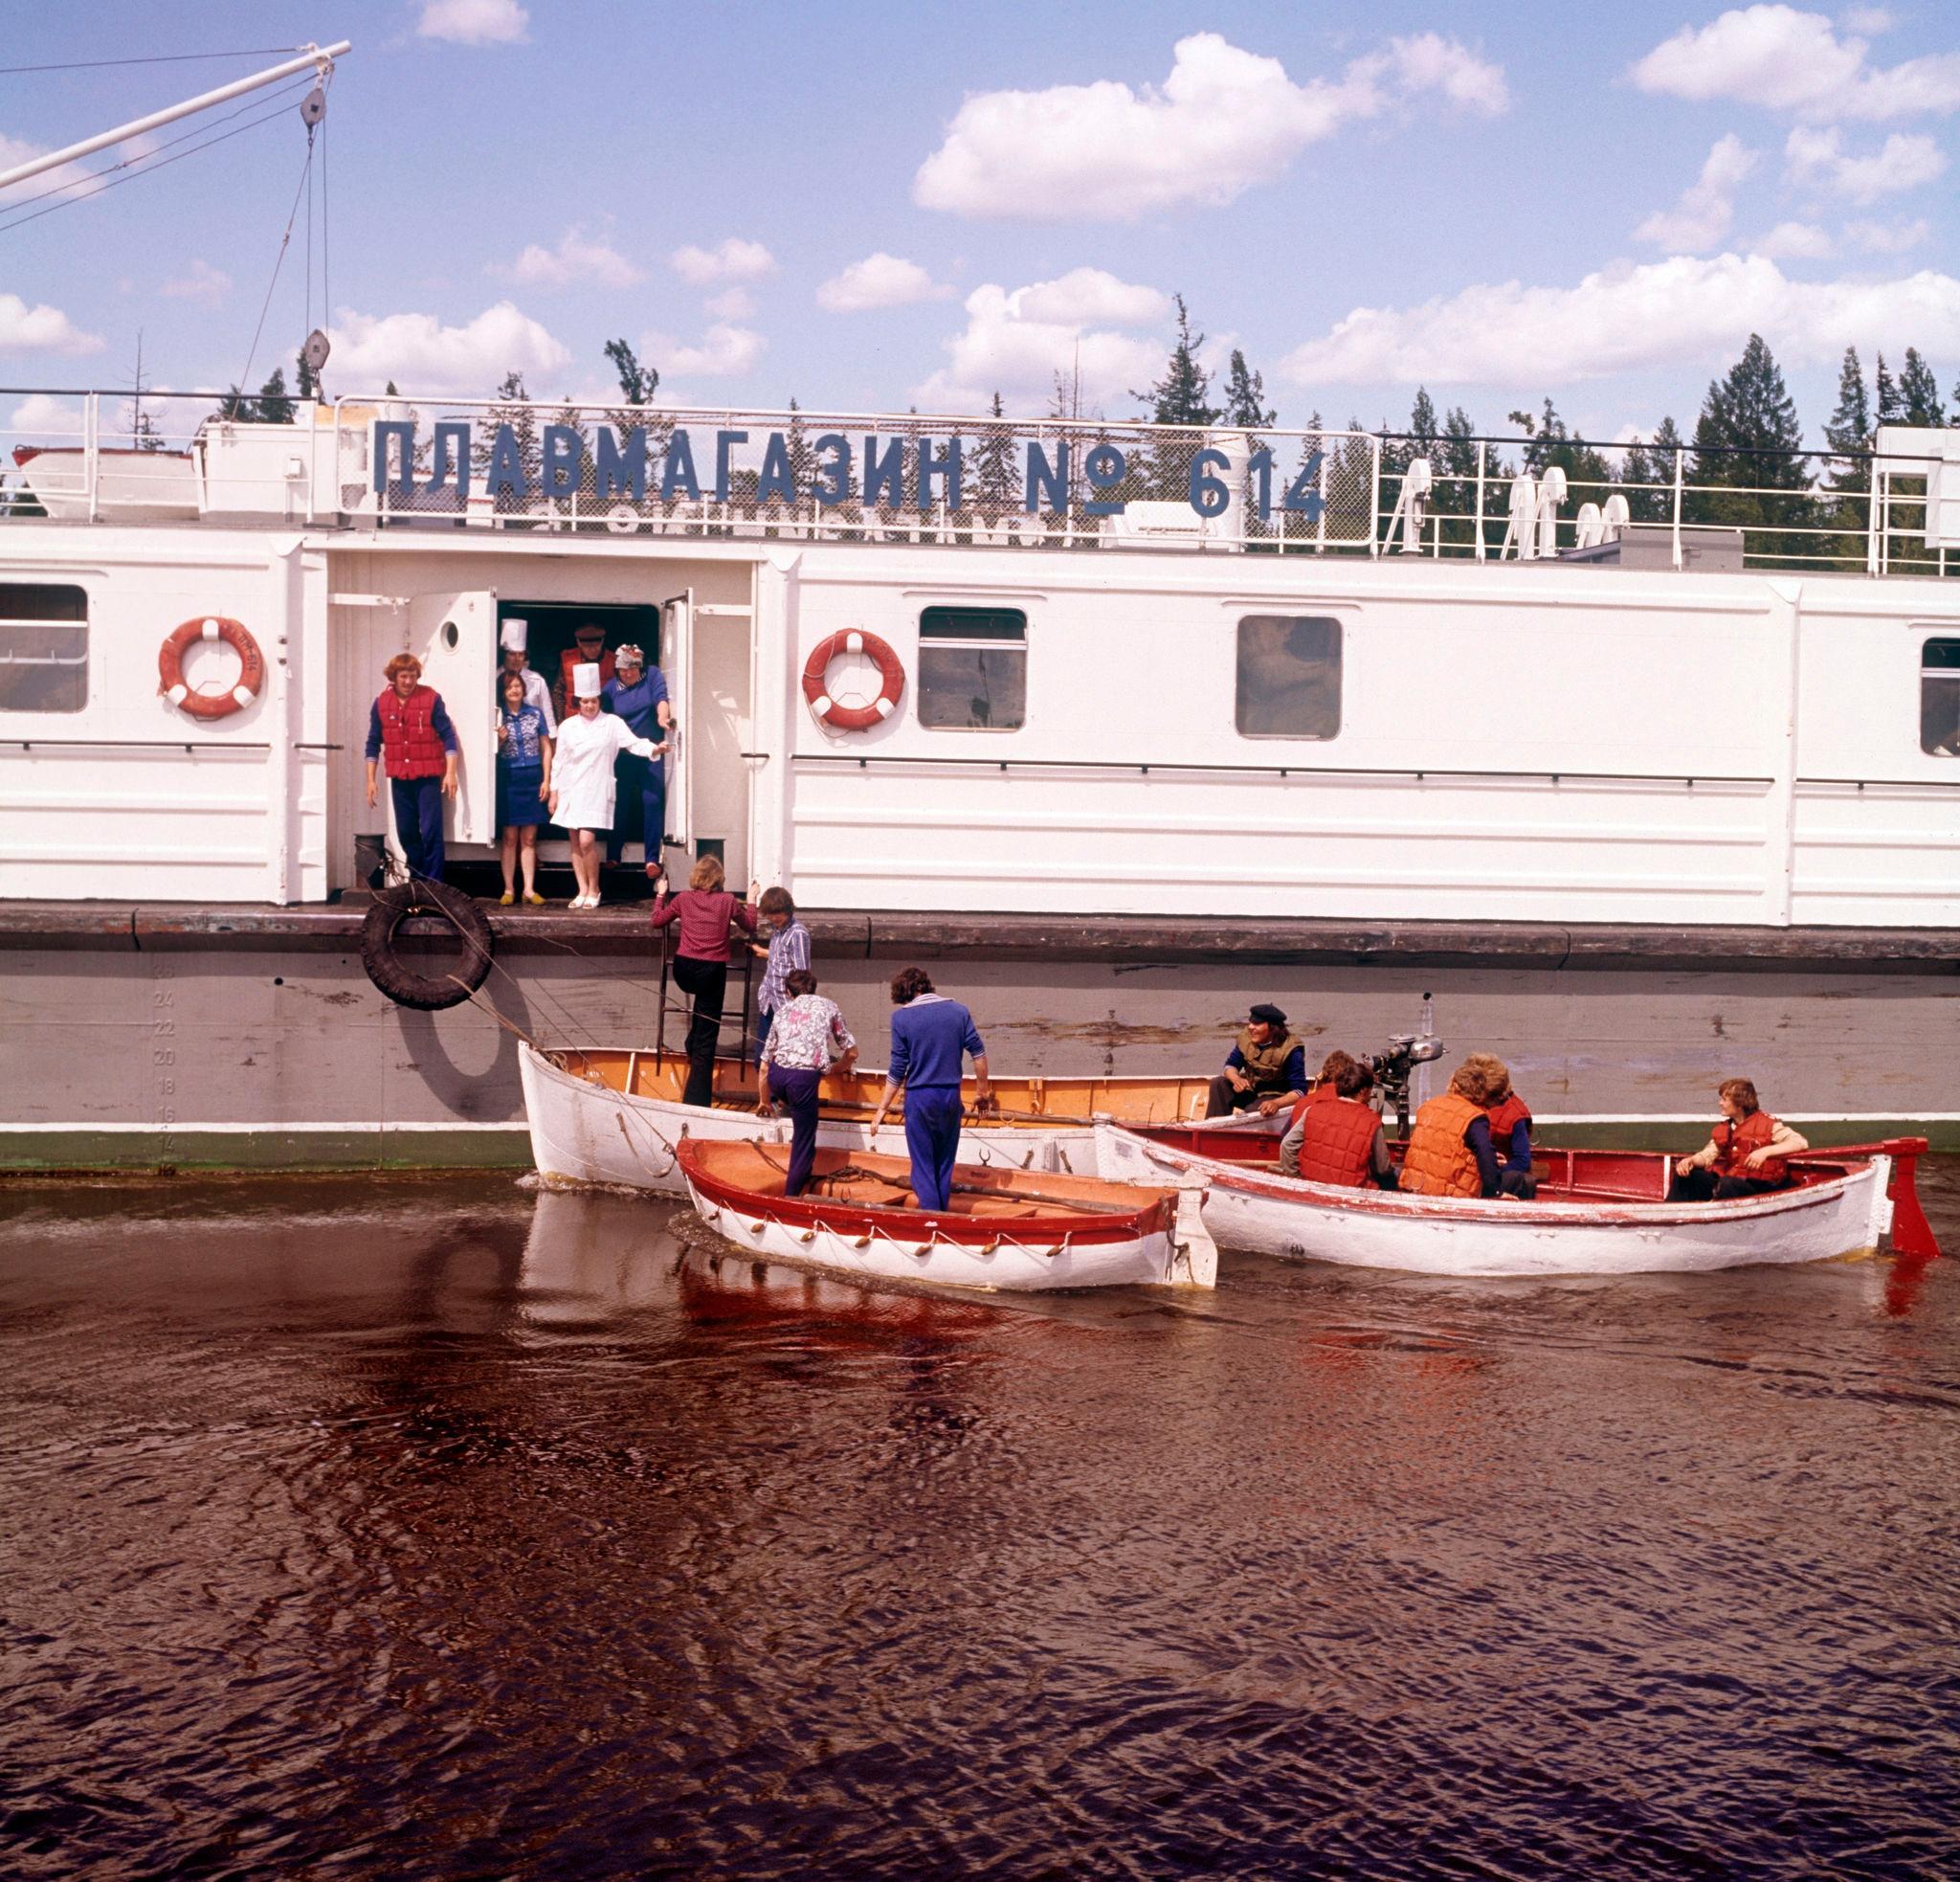 1970-е. Лена, покупатели плывут в плавучий универмаг, Плавмагазин № 614